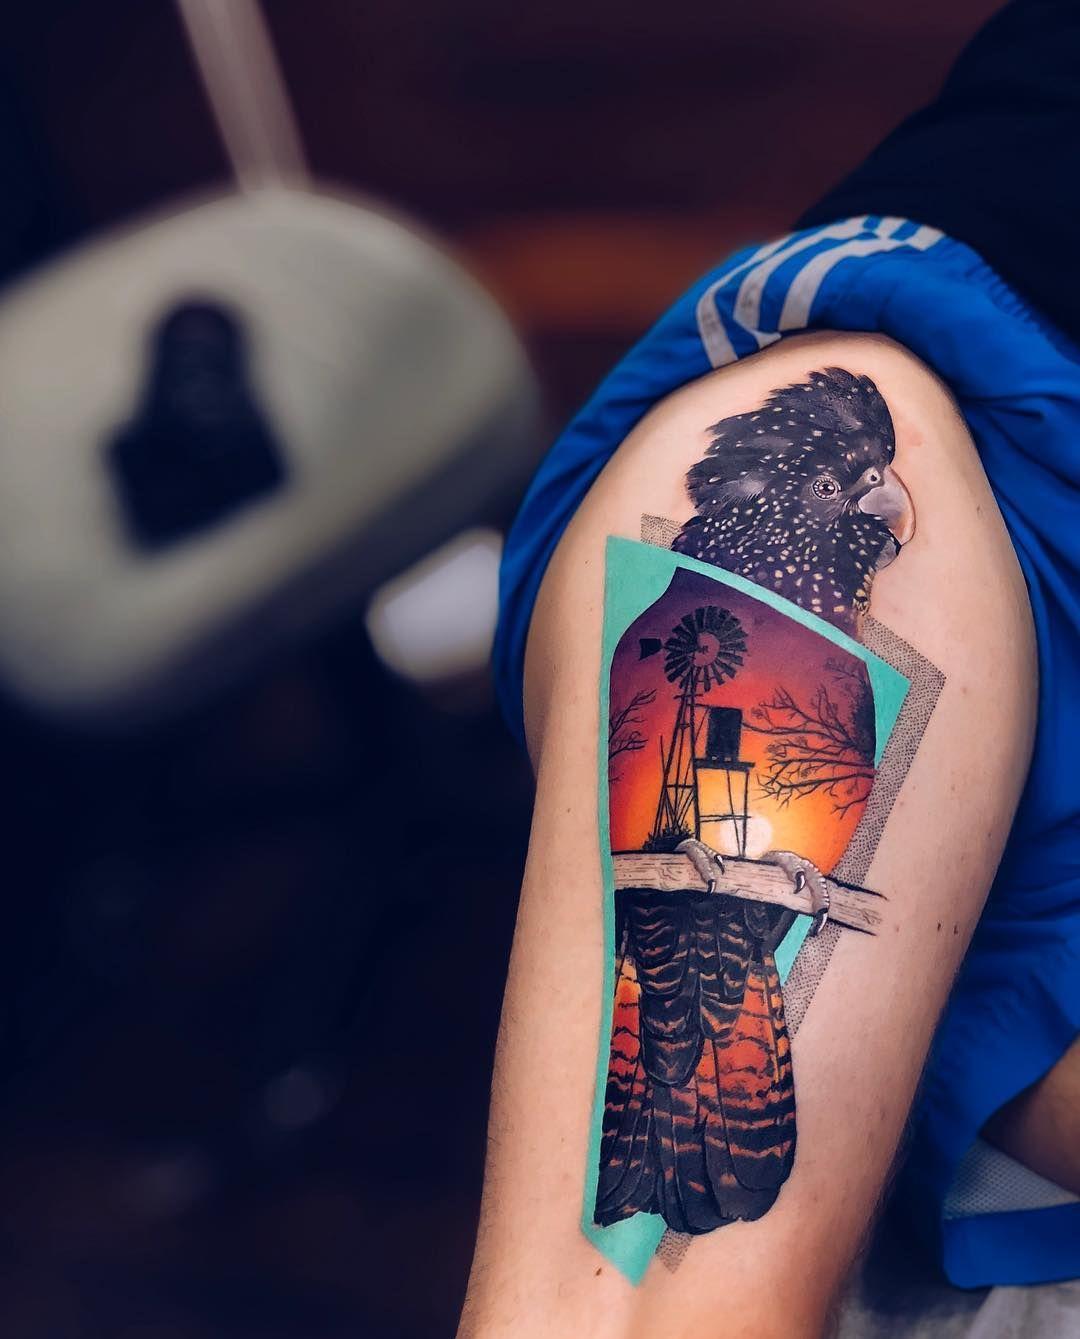 Sun Tattoos 2018 With Images Sun Tattoo Designs Sun Tattoo